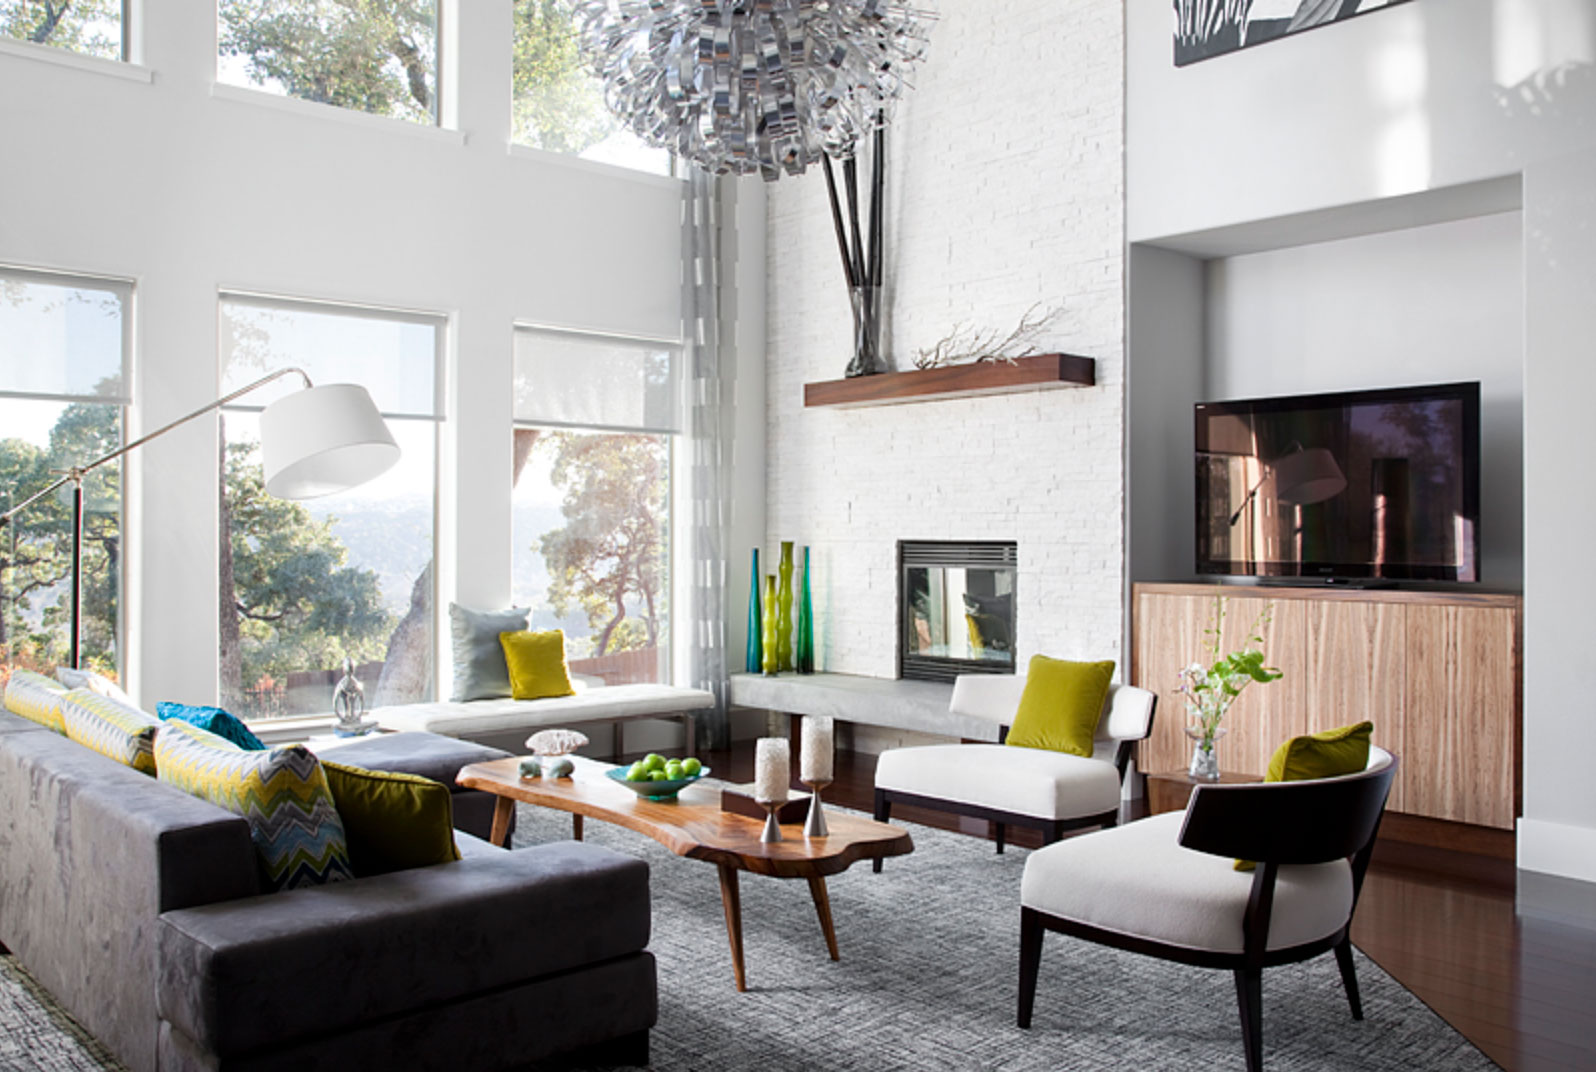 New Vistas Corporation_Blog_Tenant-Friendly Interior Design Trends in 2016 (1)